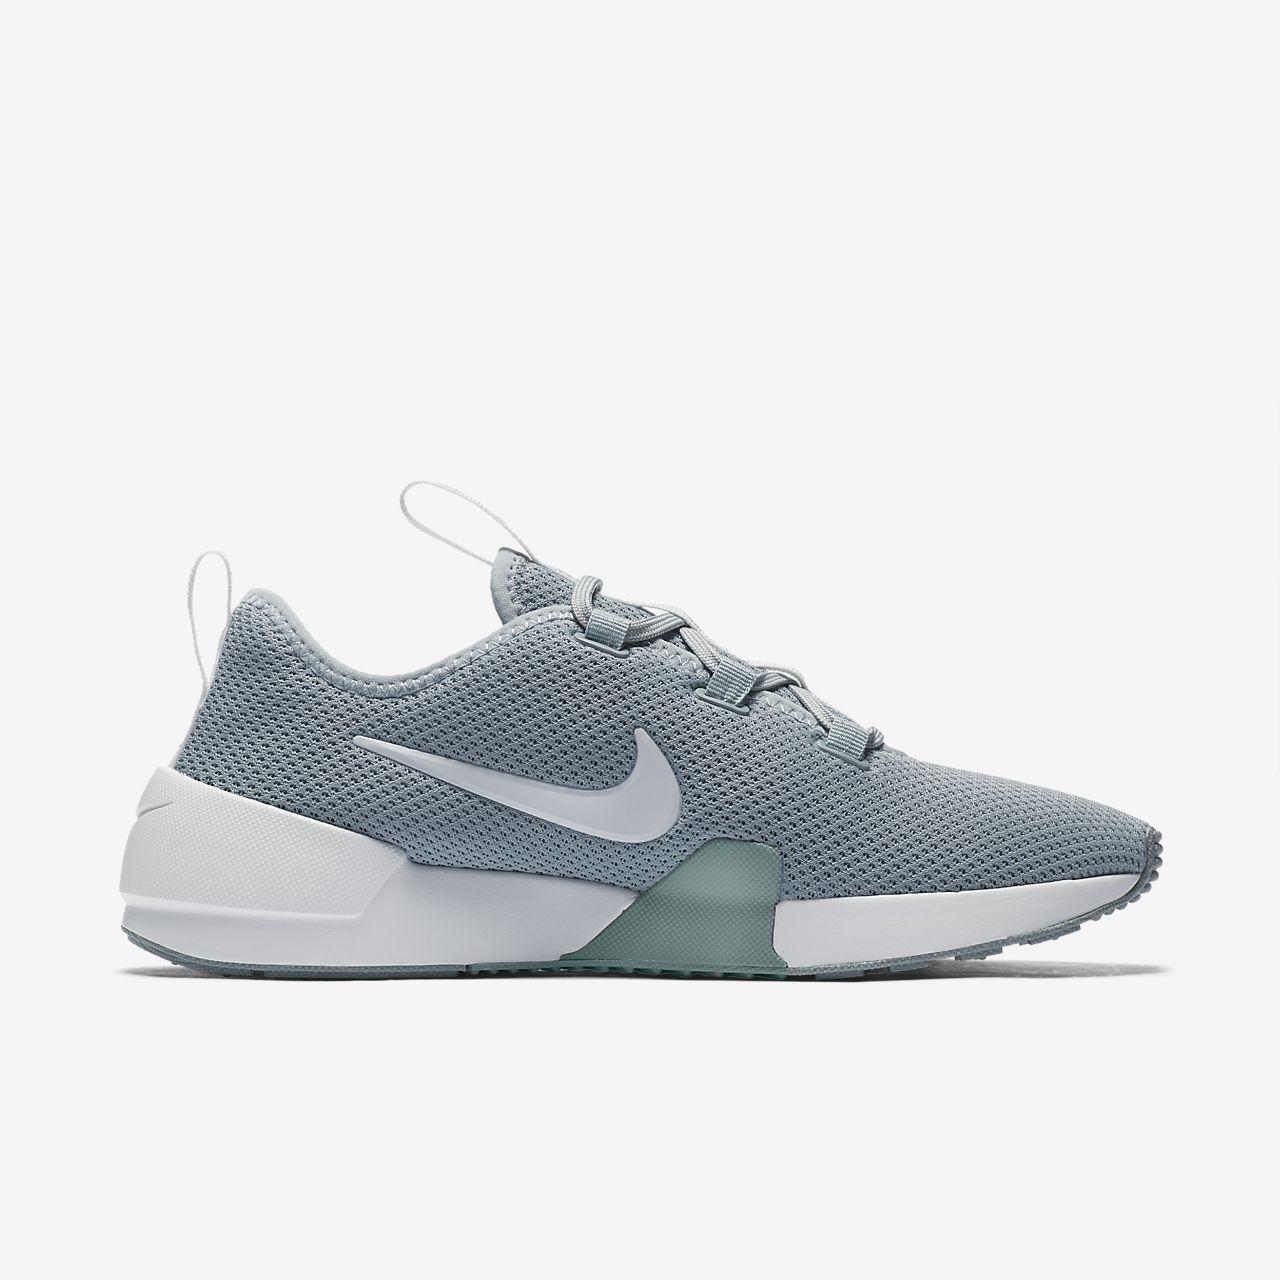 the best attitude 7d2cf ce87c ... Chaussure Nike Ashin Modern Run pour Femme